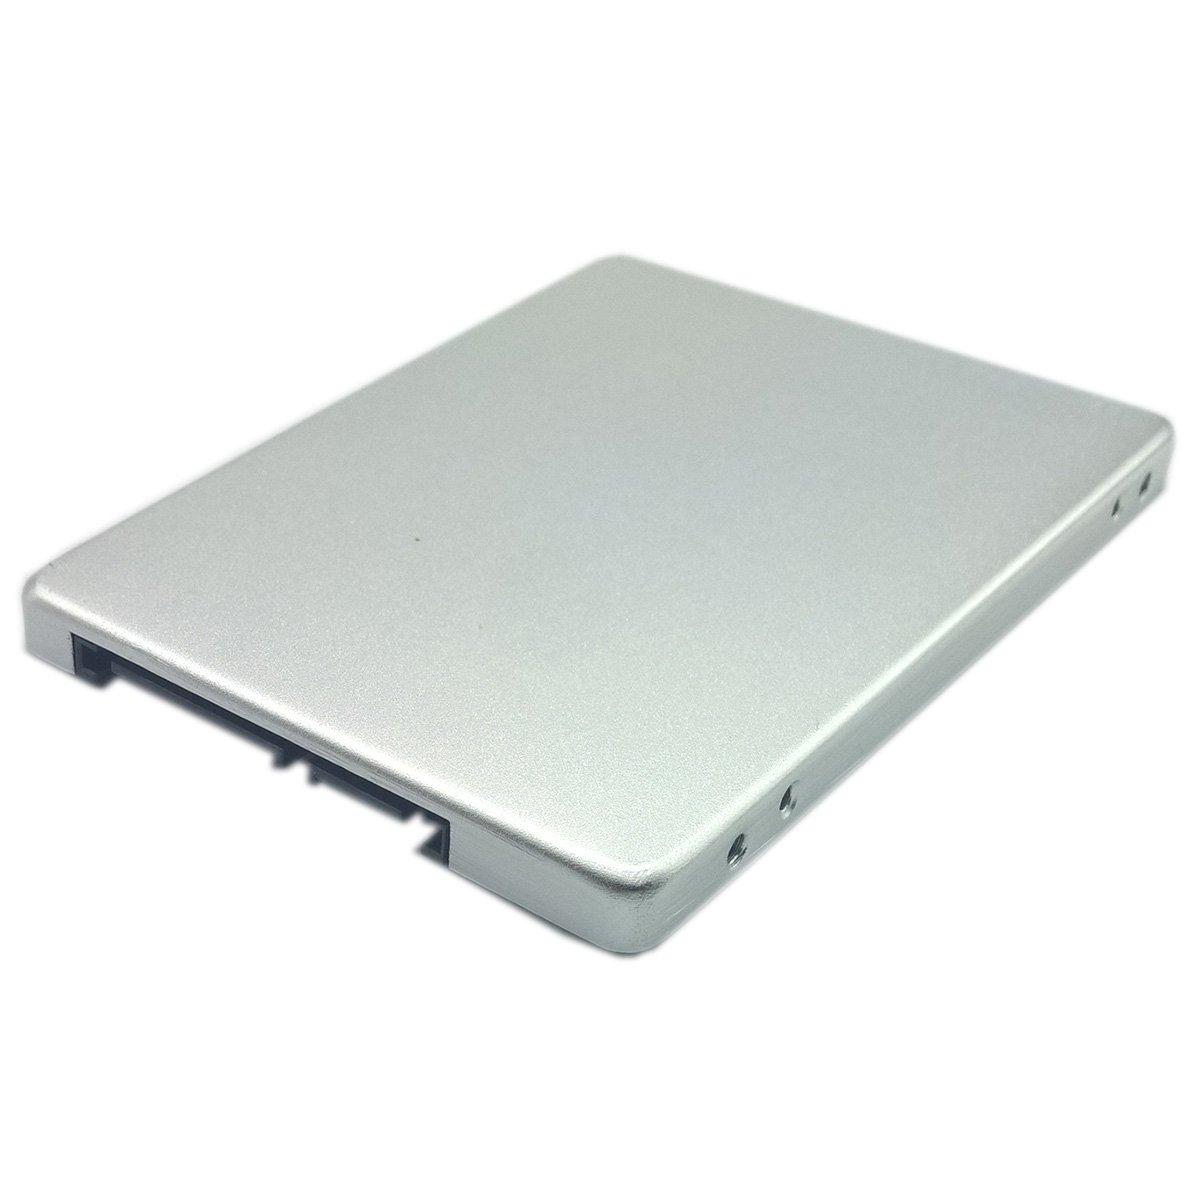 "SNANSHI Mini PCI-E mSATA SSD to 2.5"" SATA3 Adapter with 7mm Aluminum Case"